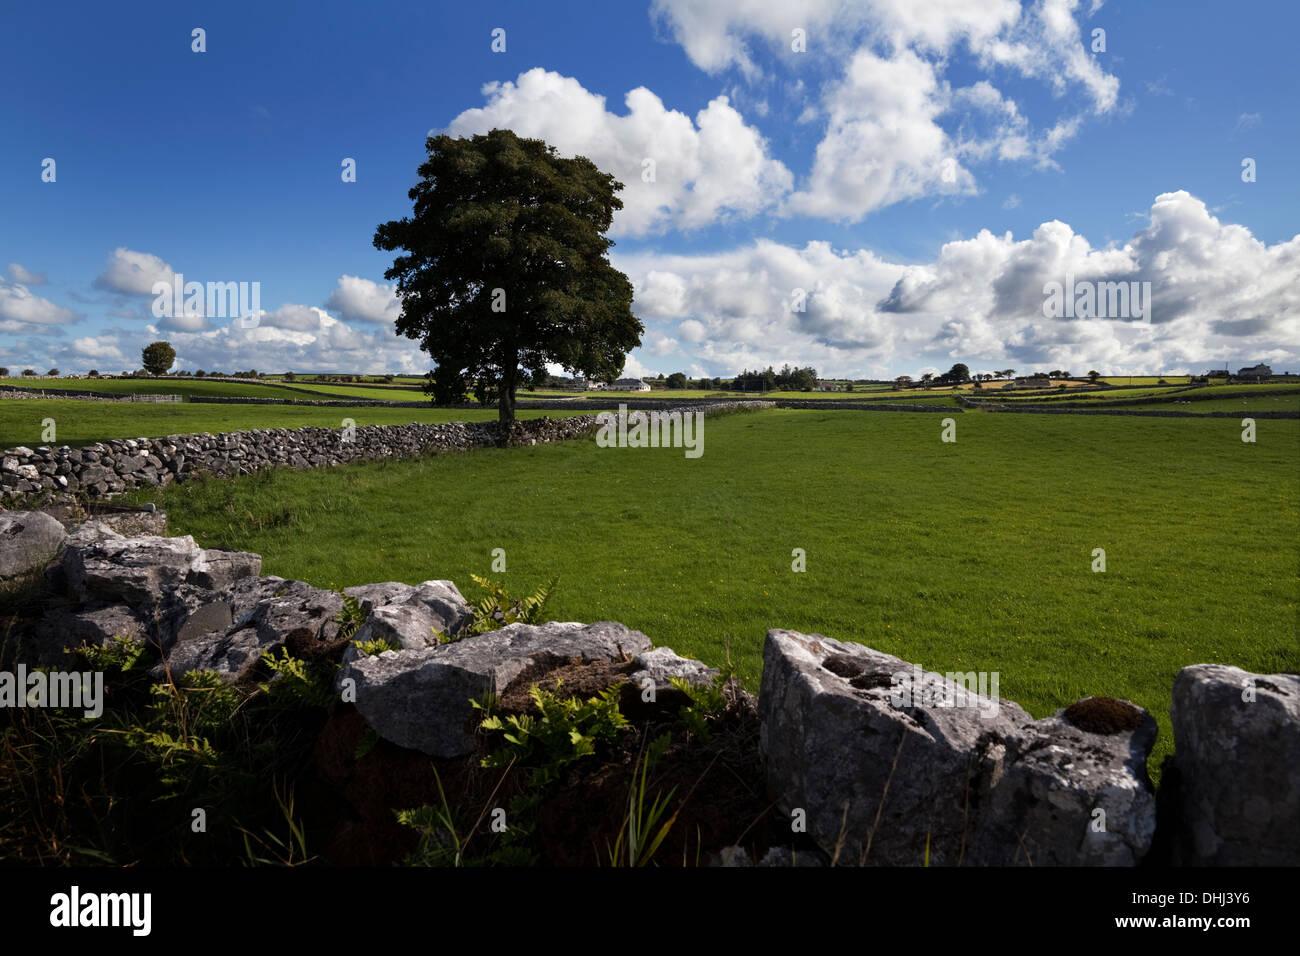 Pastoral farmland between Clonbur and Ballinrobe, County Mayo, Ireland - Stock Image